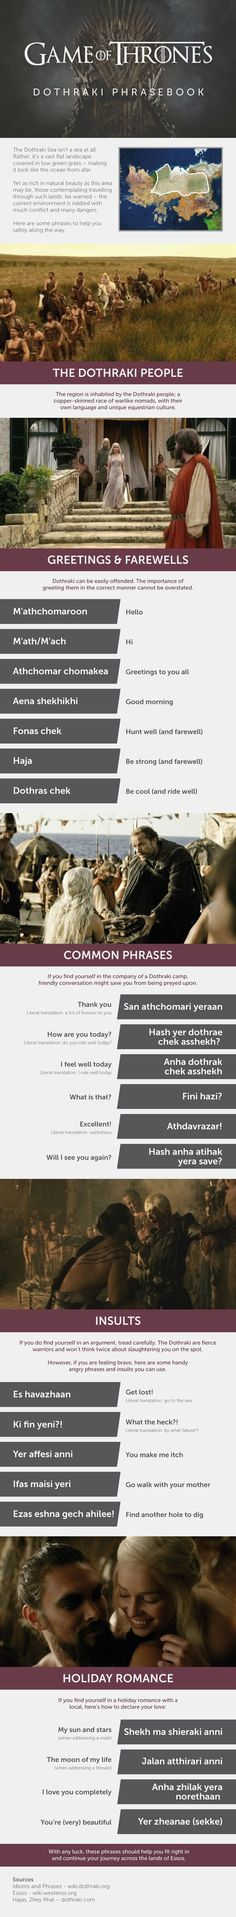 Fandom Friday: 5 Useful Game of Thrones Infographics -Dothraki